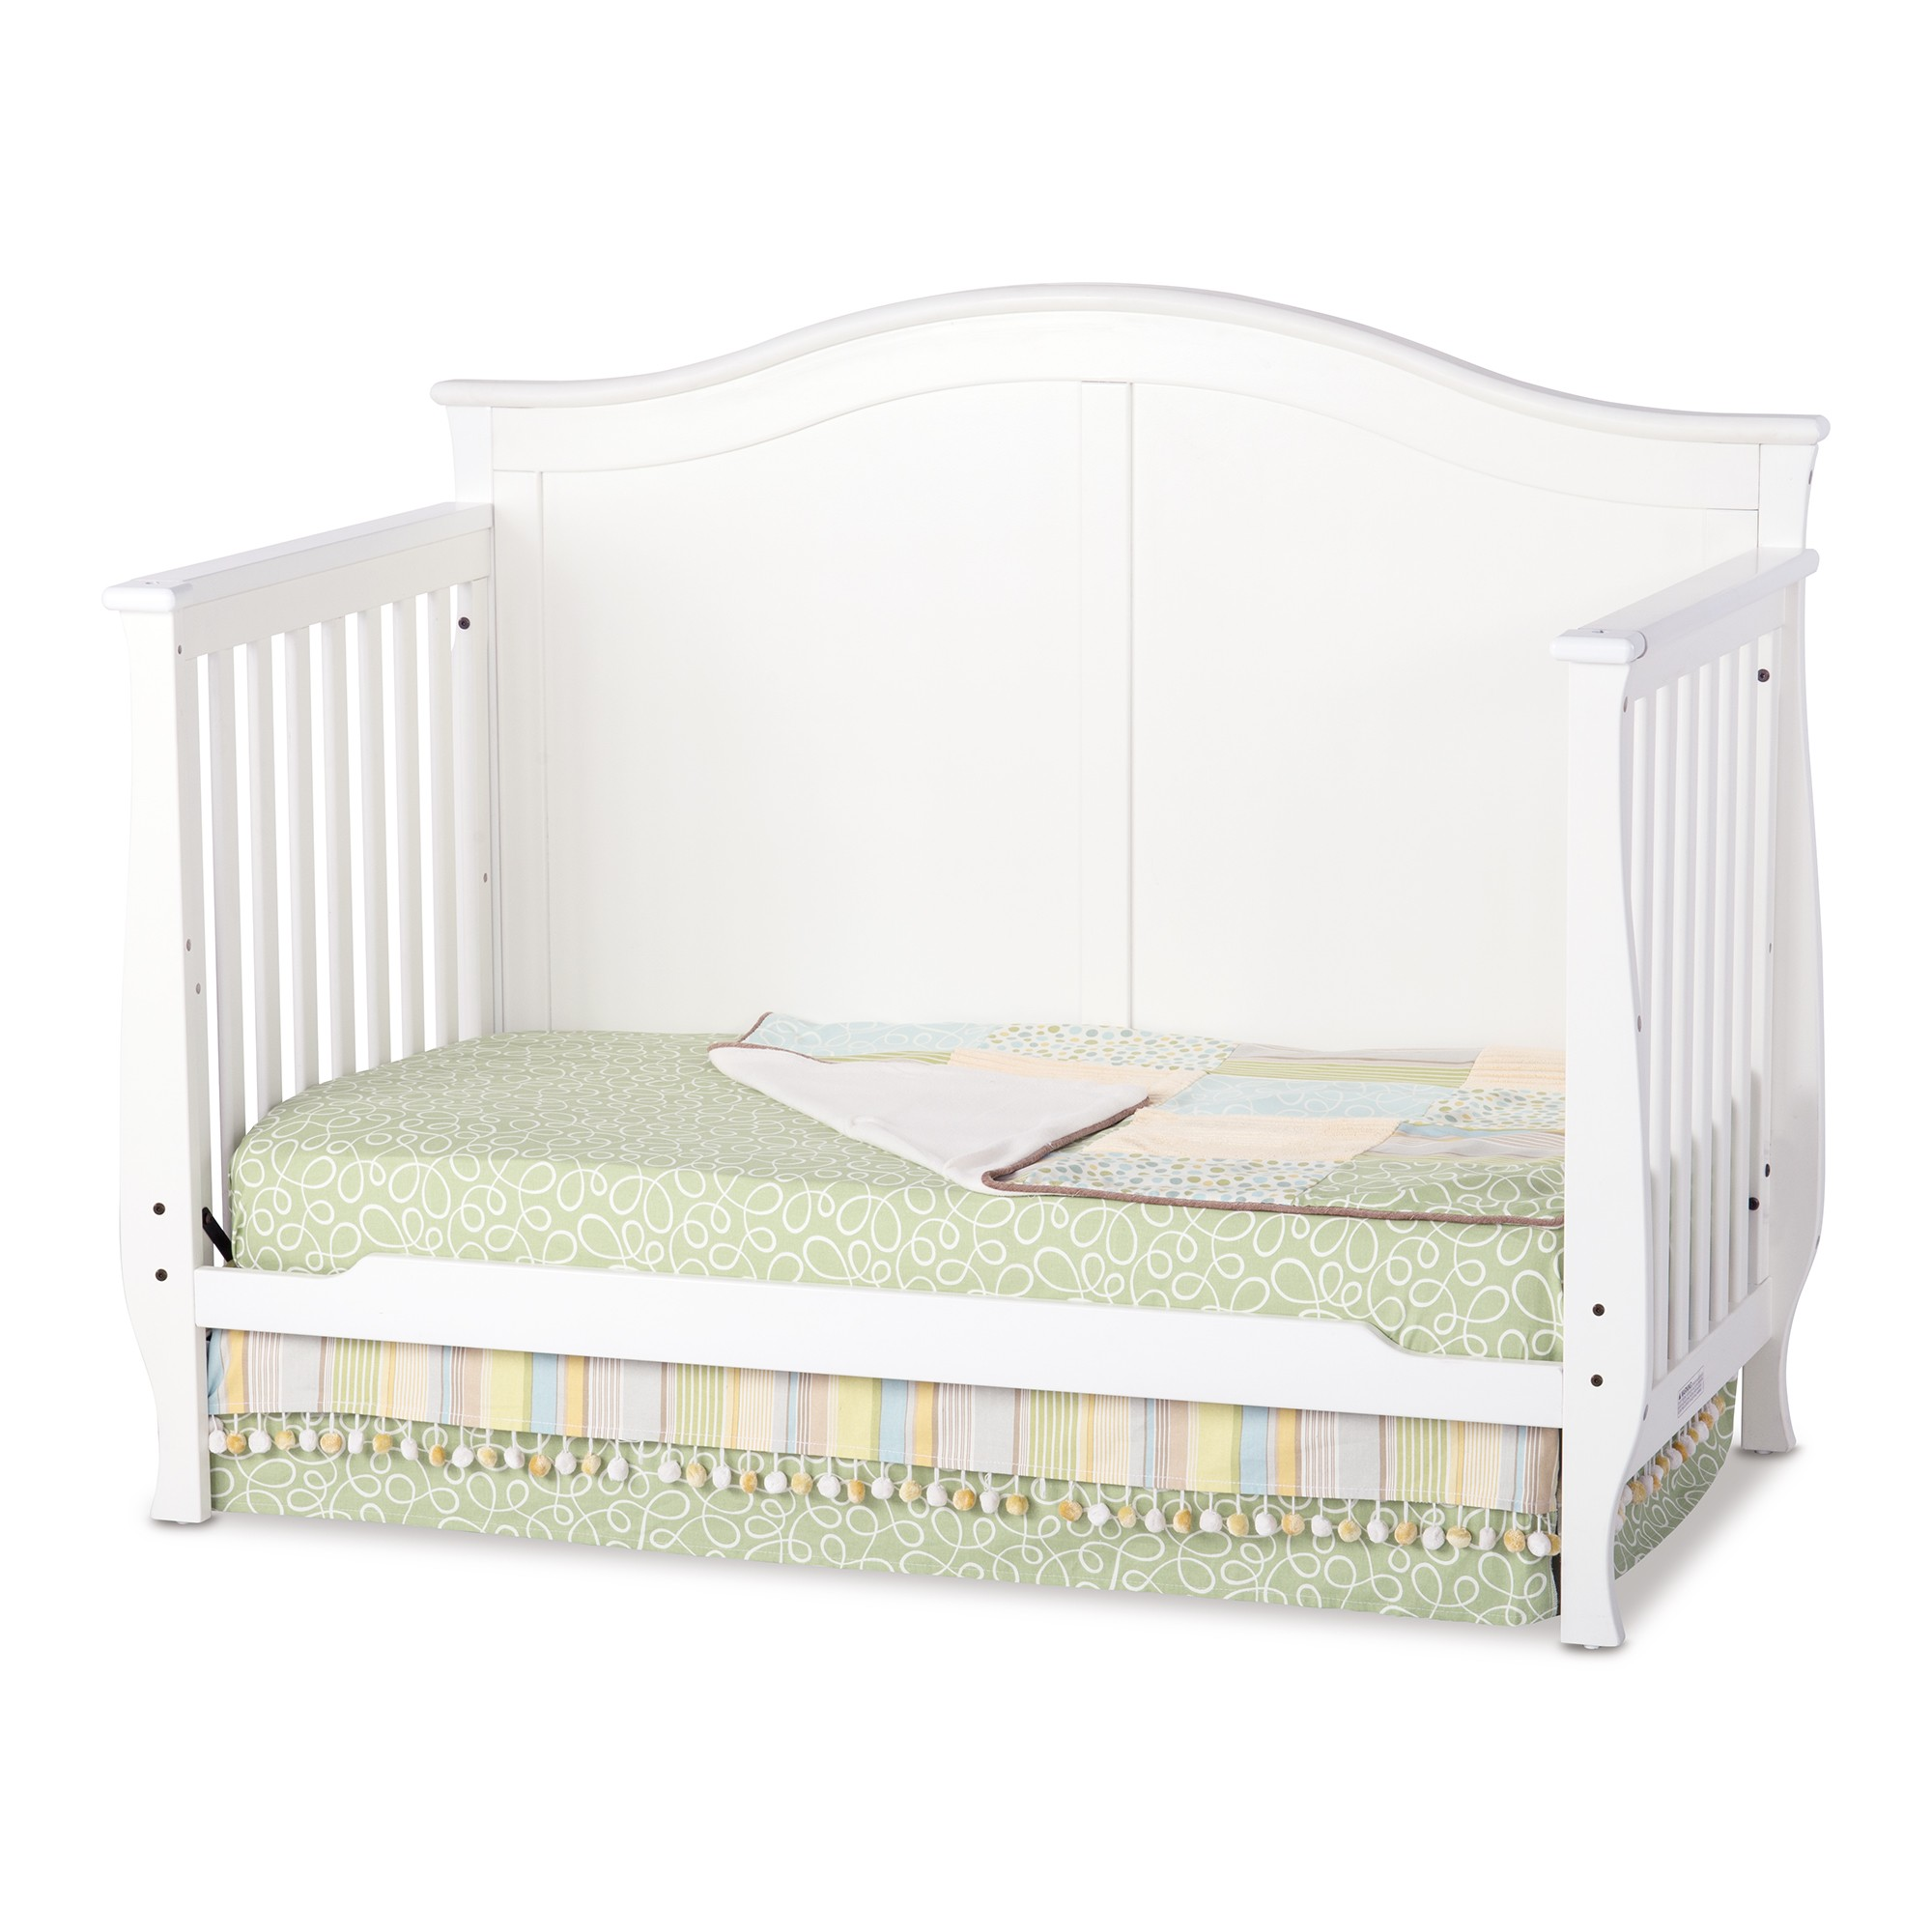 Child craft coventry crib - Child Craft Coventry Crib 49